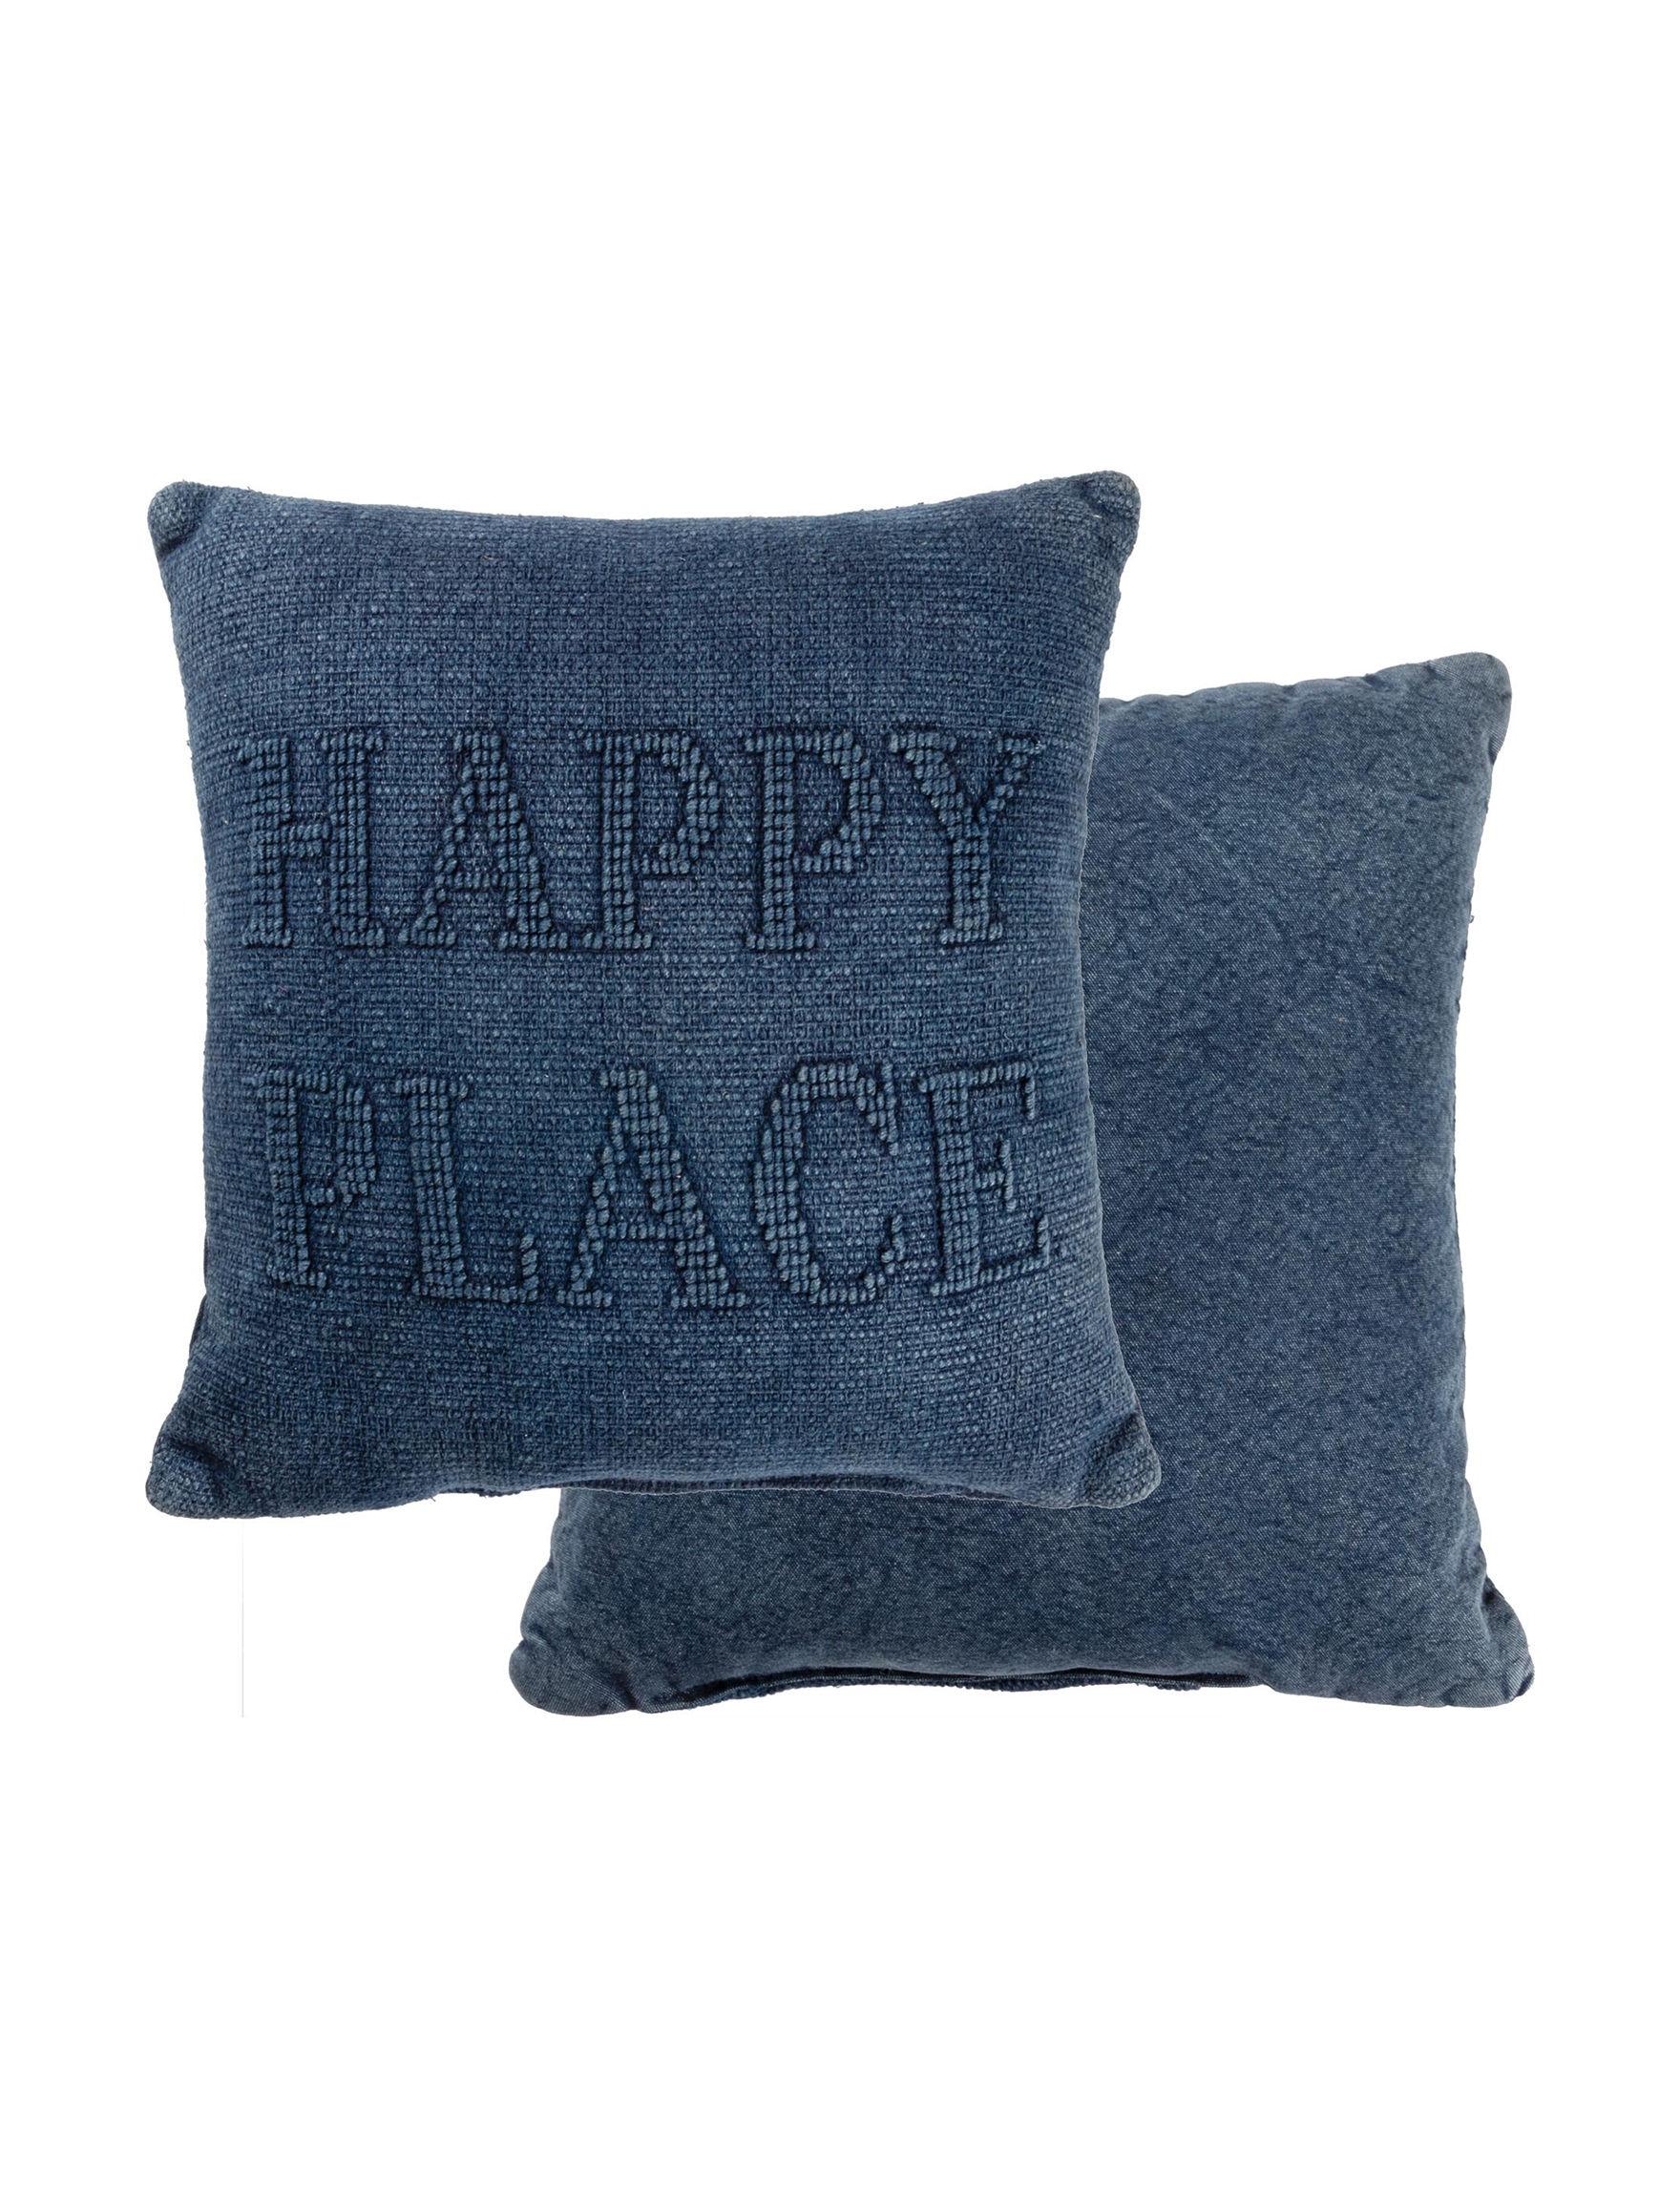 Primitives by Kathy Blue Decorative Pillows